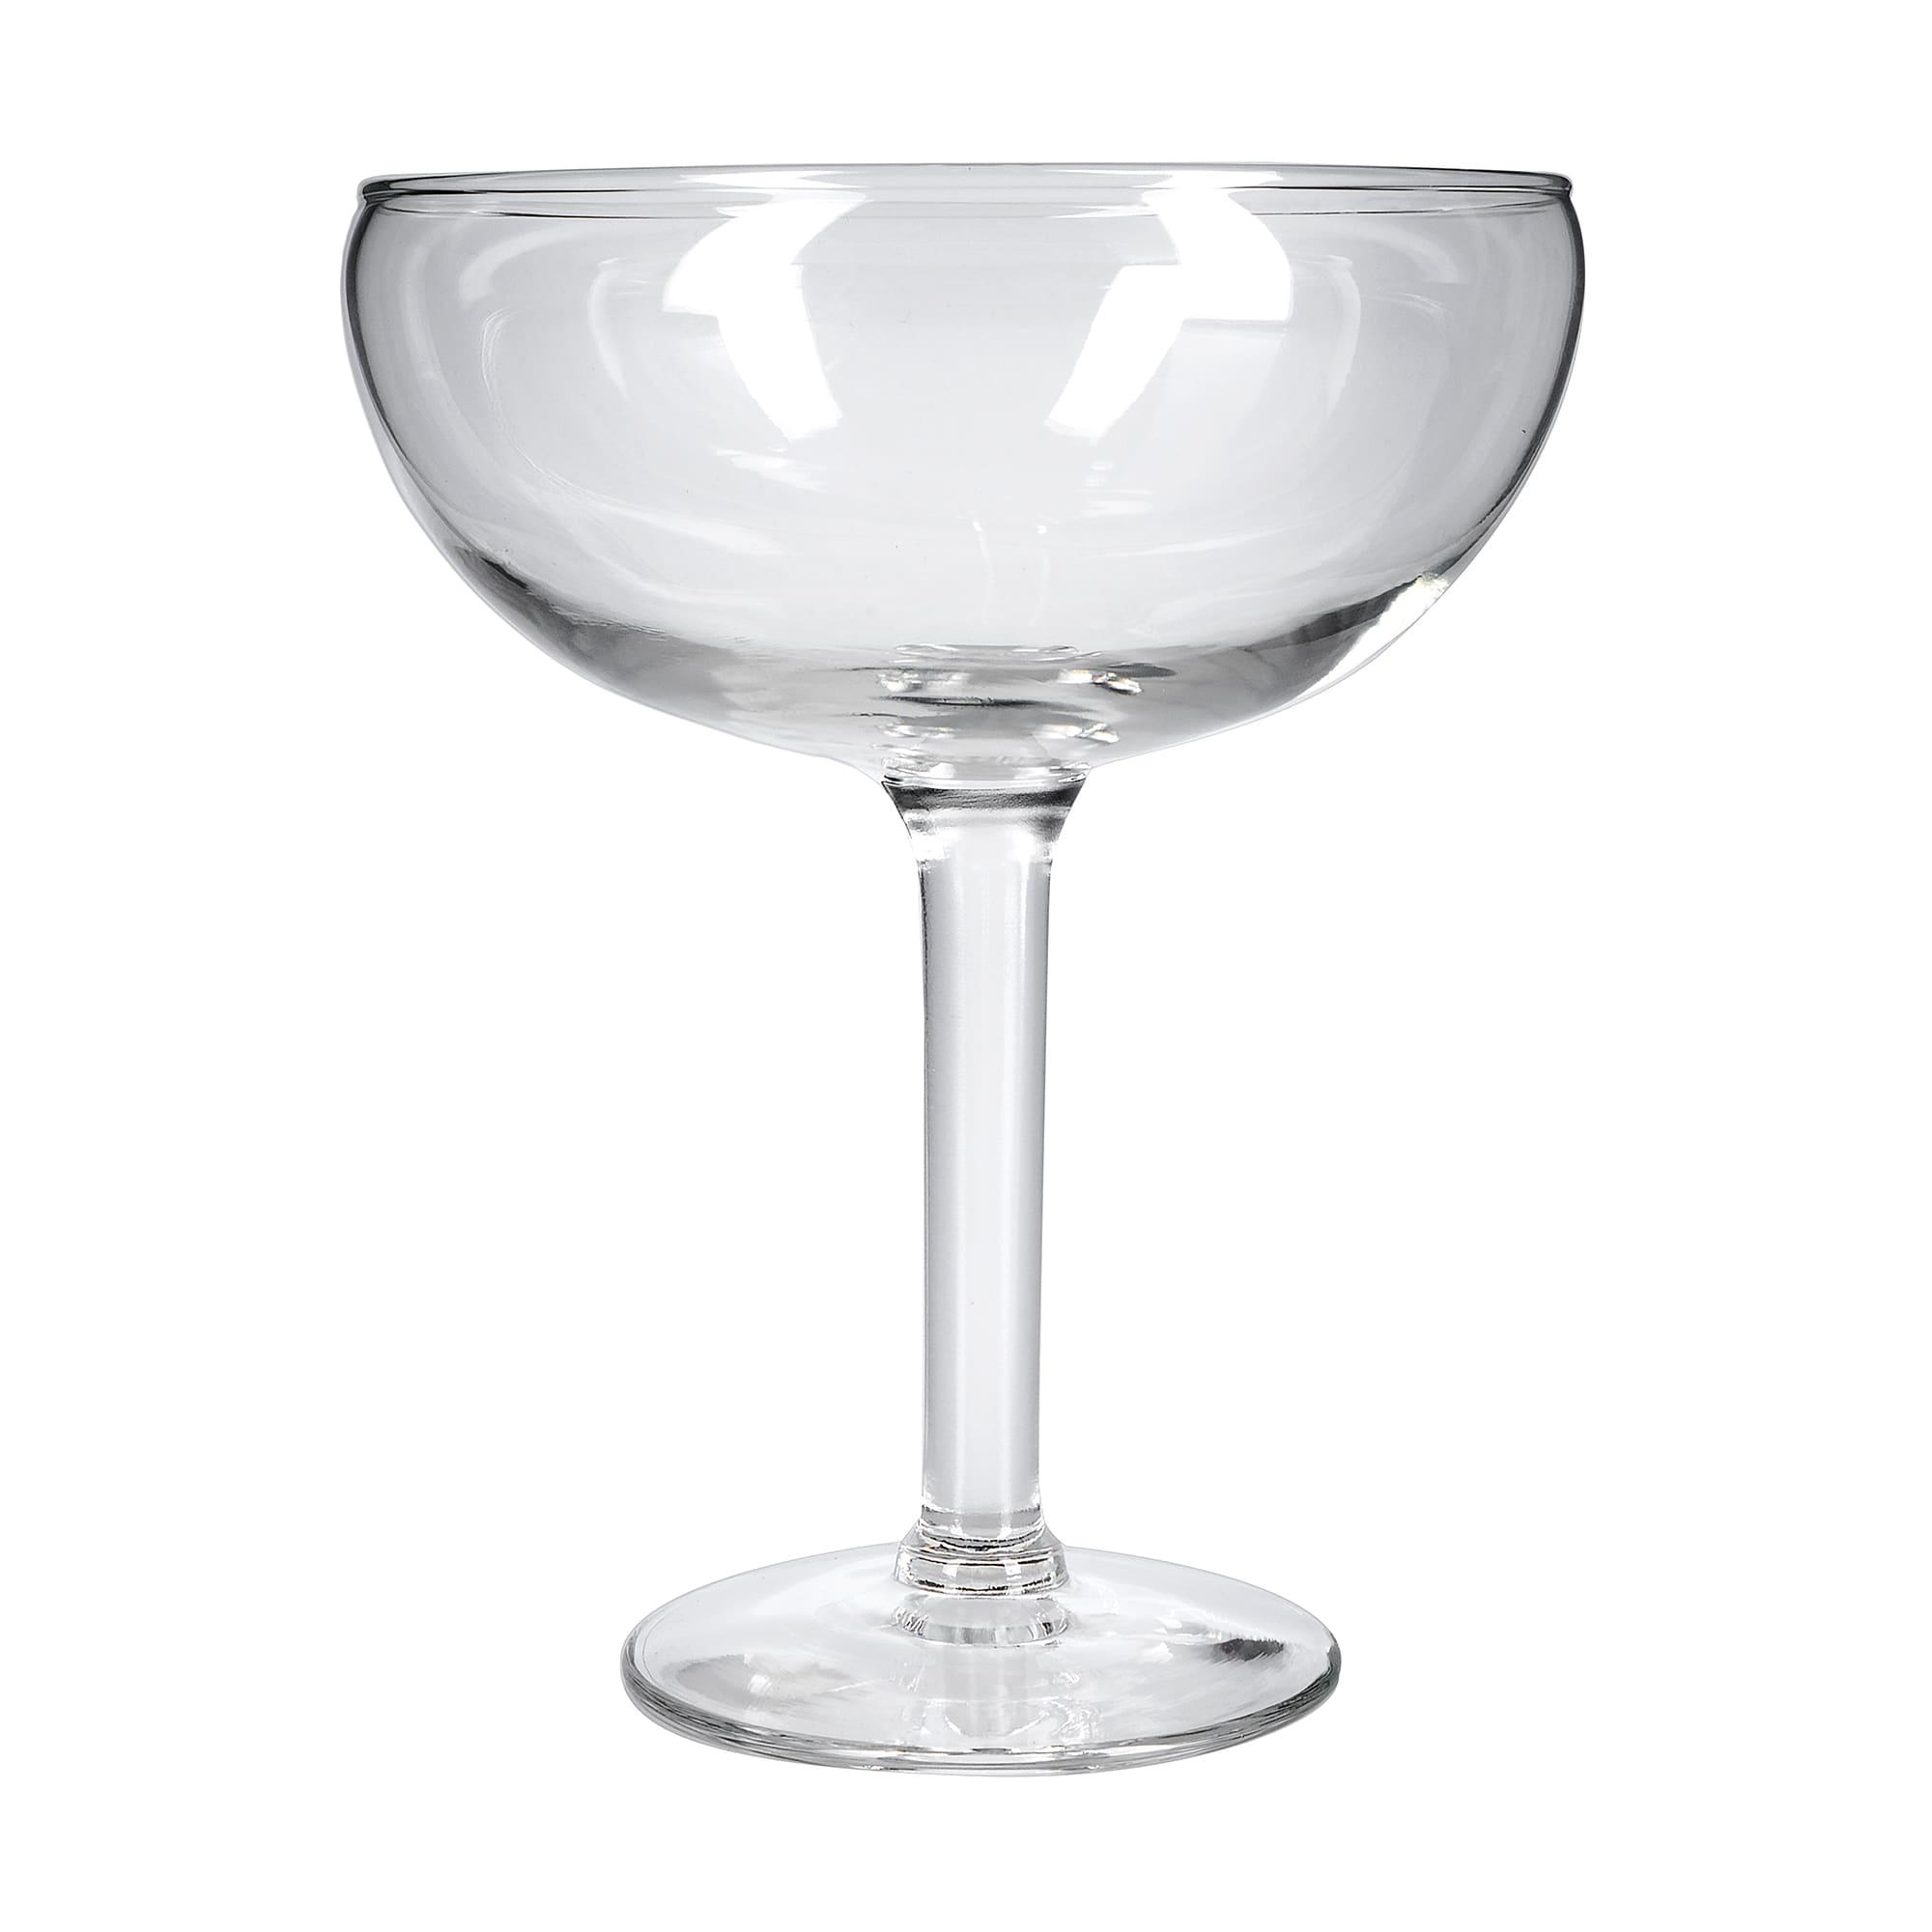 Libbey 8422 15.75-oz Fiesta Grande Collection Glass - Safedge Rim Guarantee